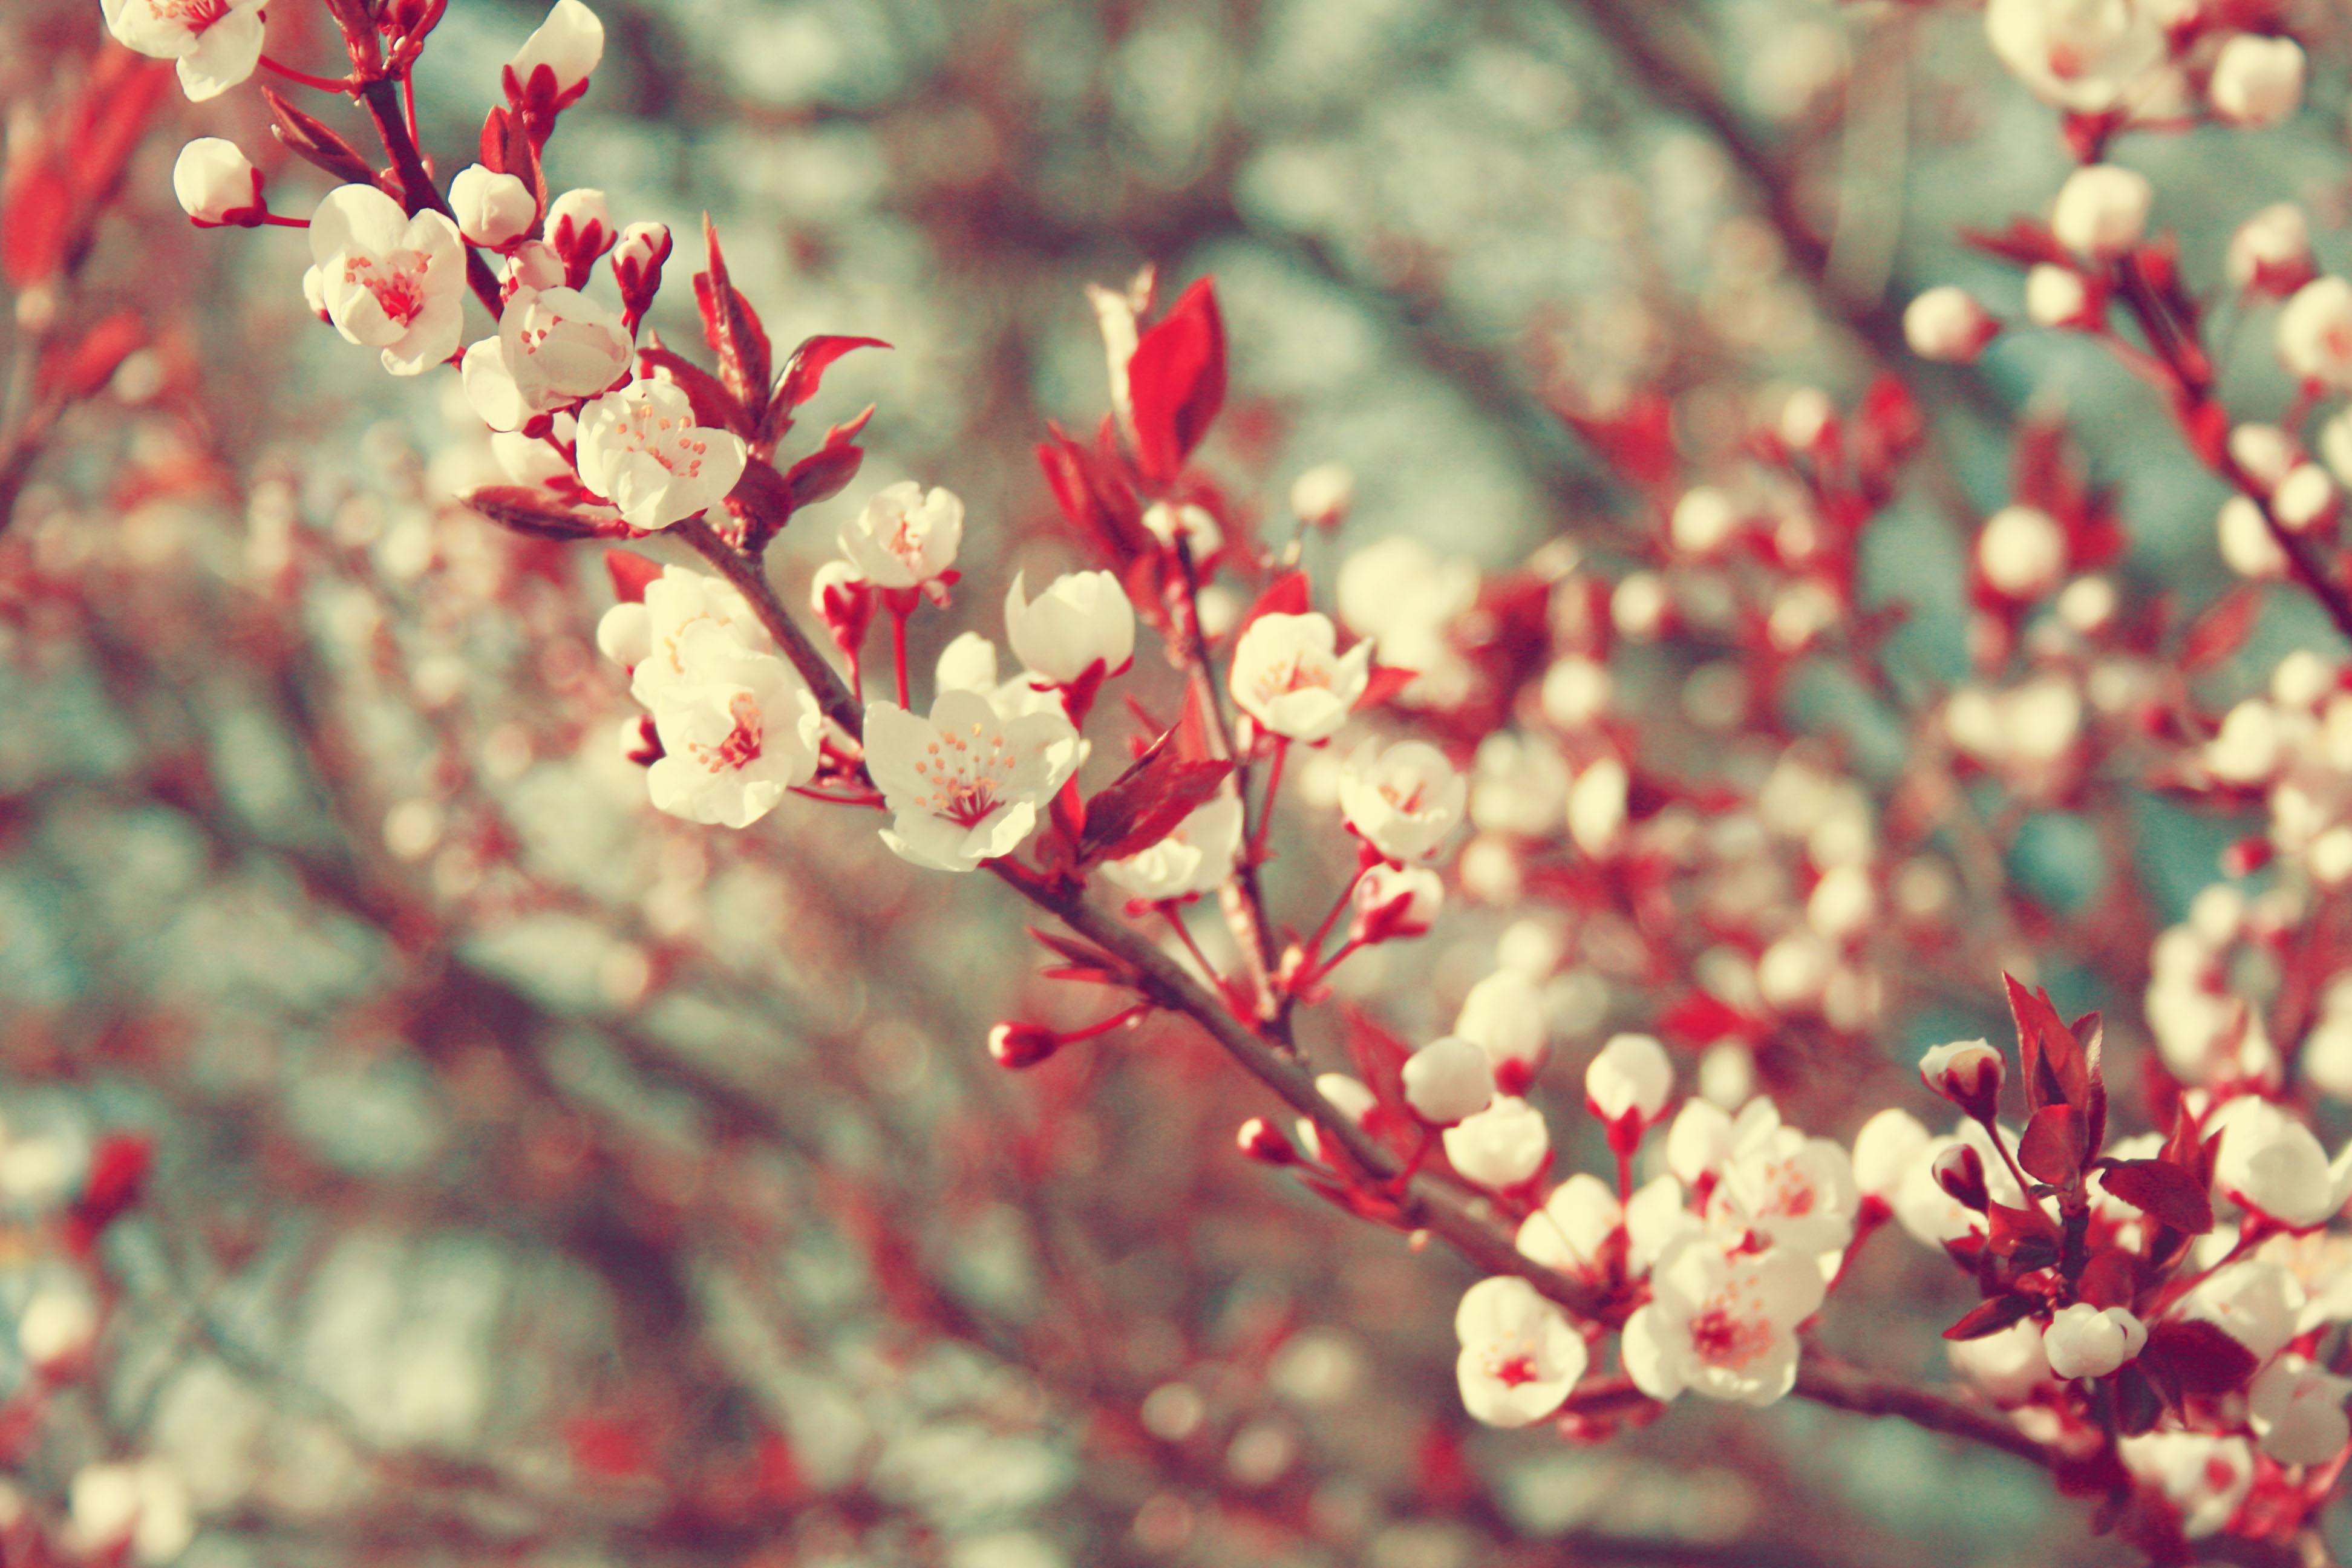 tumblr wallpaper floral hd - photo #39